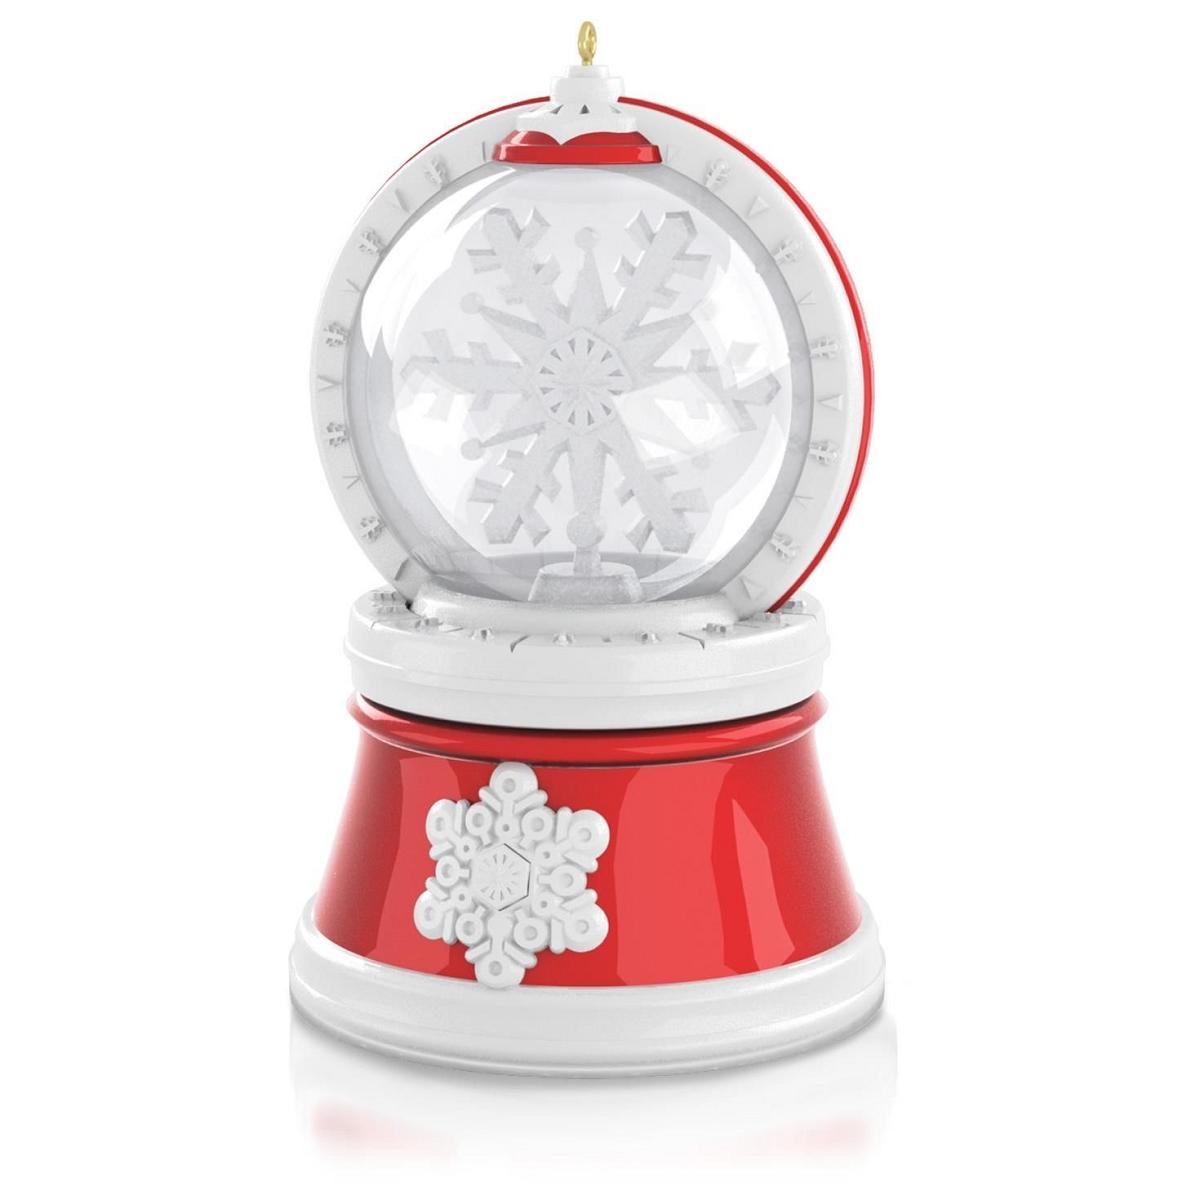 2015 Happiness Makes Magic Hallmark Keepsake Ornament